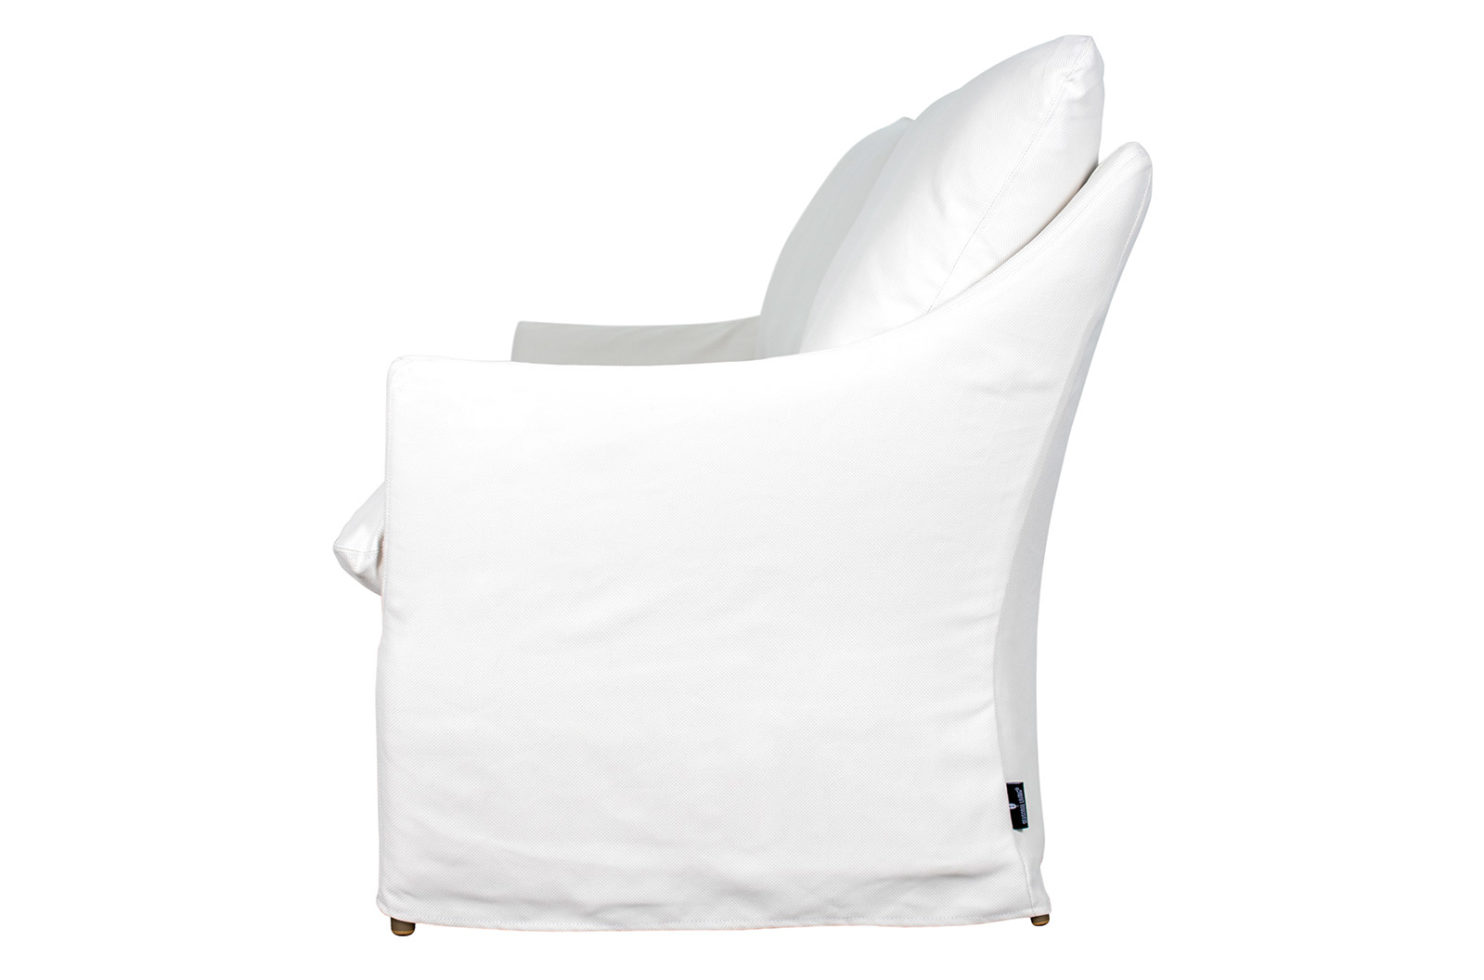 capri sofa 620FT094FC GW 1 side